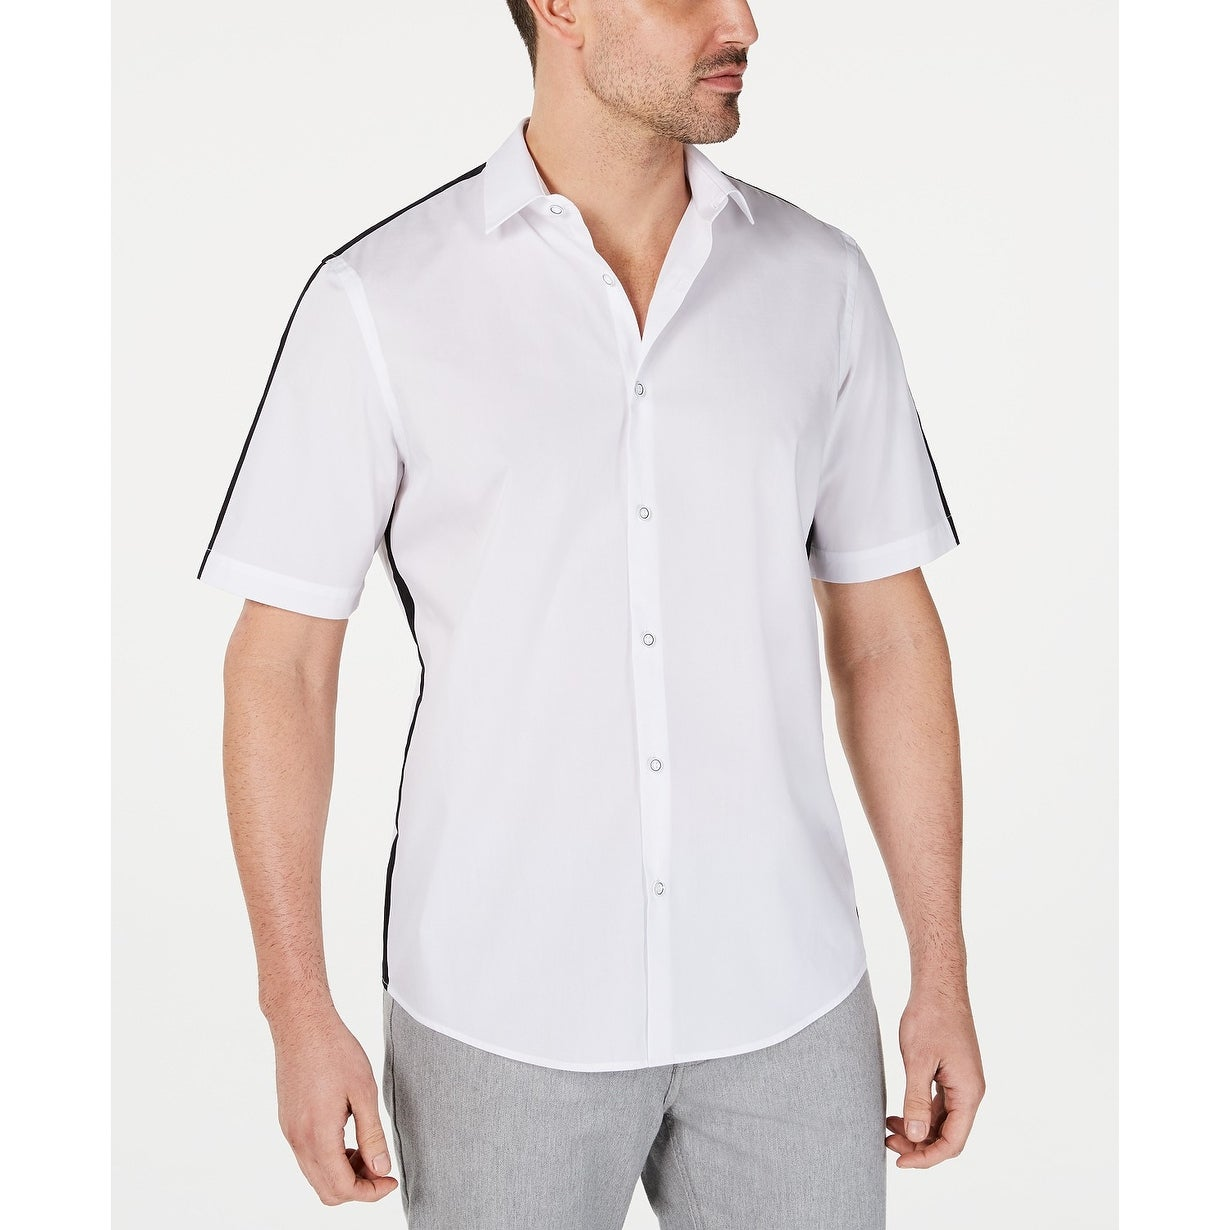 Alfani Men/'s Colorblocked Silk Blend Short Sleeve Shirt Wash White 17301CSW